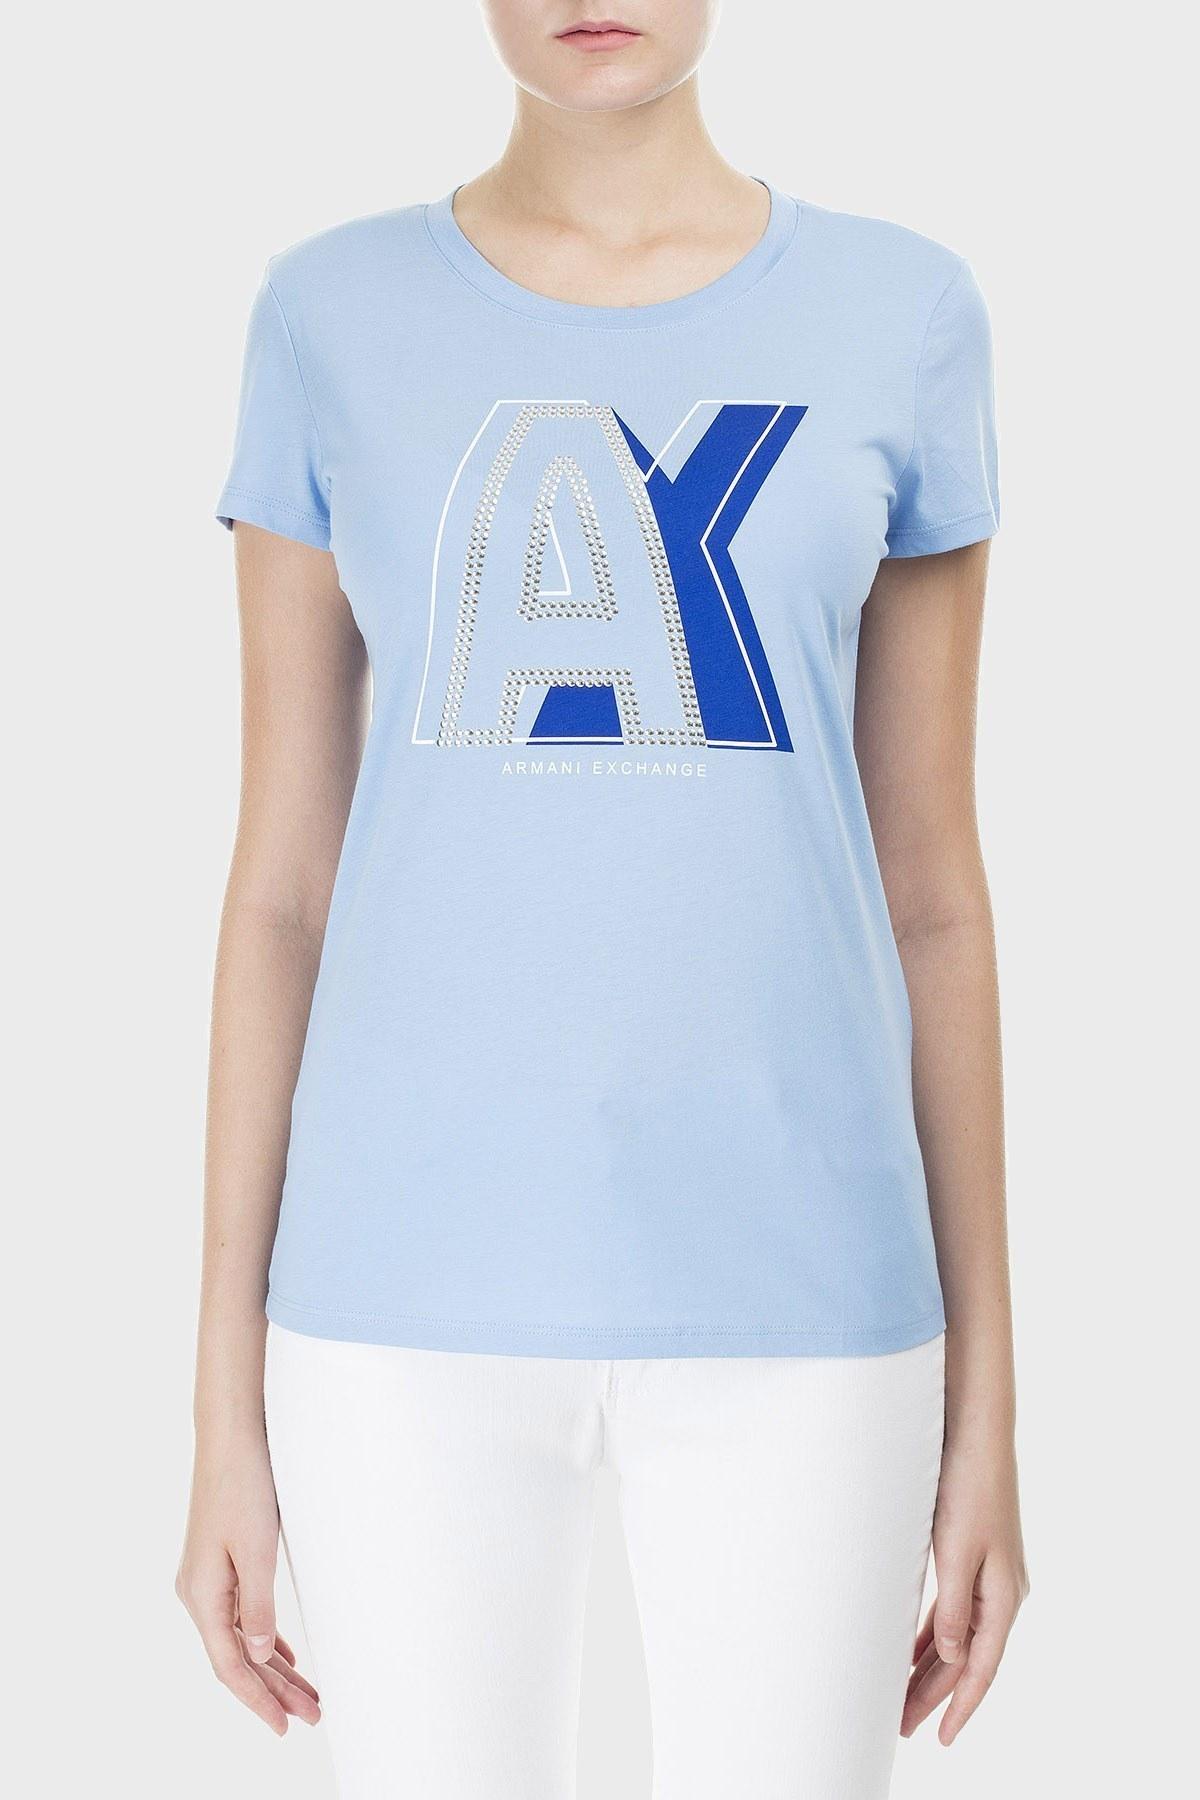 Armani Exchange Baskılı % 100 Pamuk Bisiklet Yaka Bayan T Shirt 3HYTCF YJ16Z 1516 MAVİ